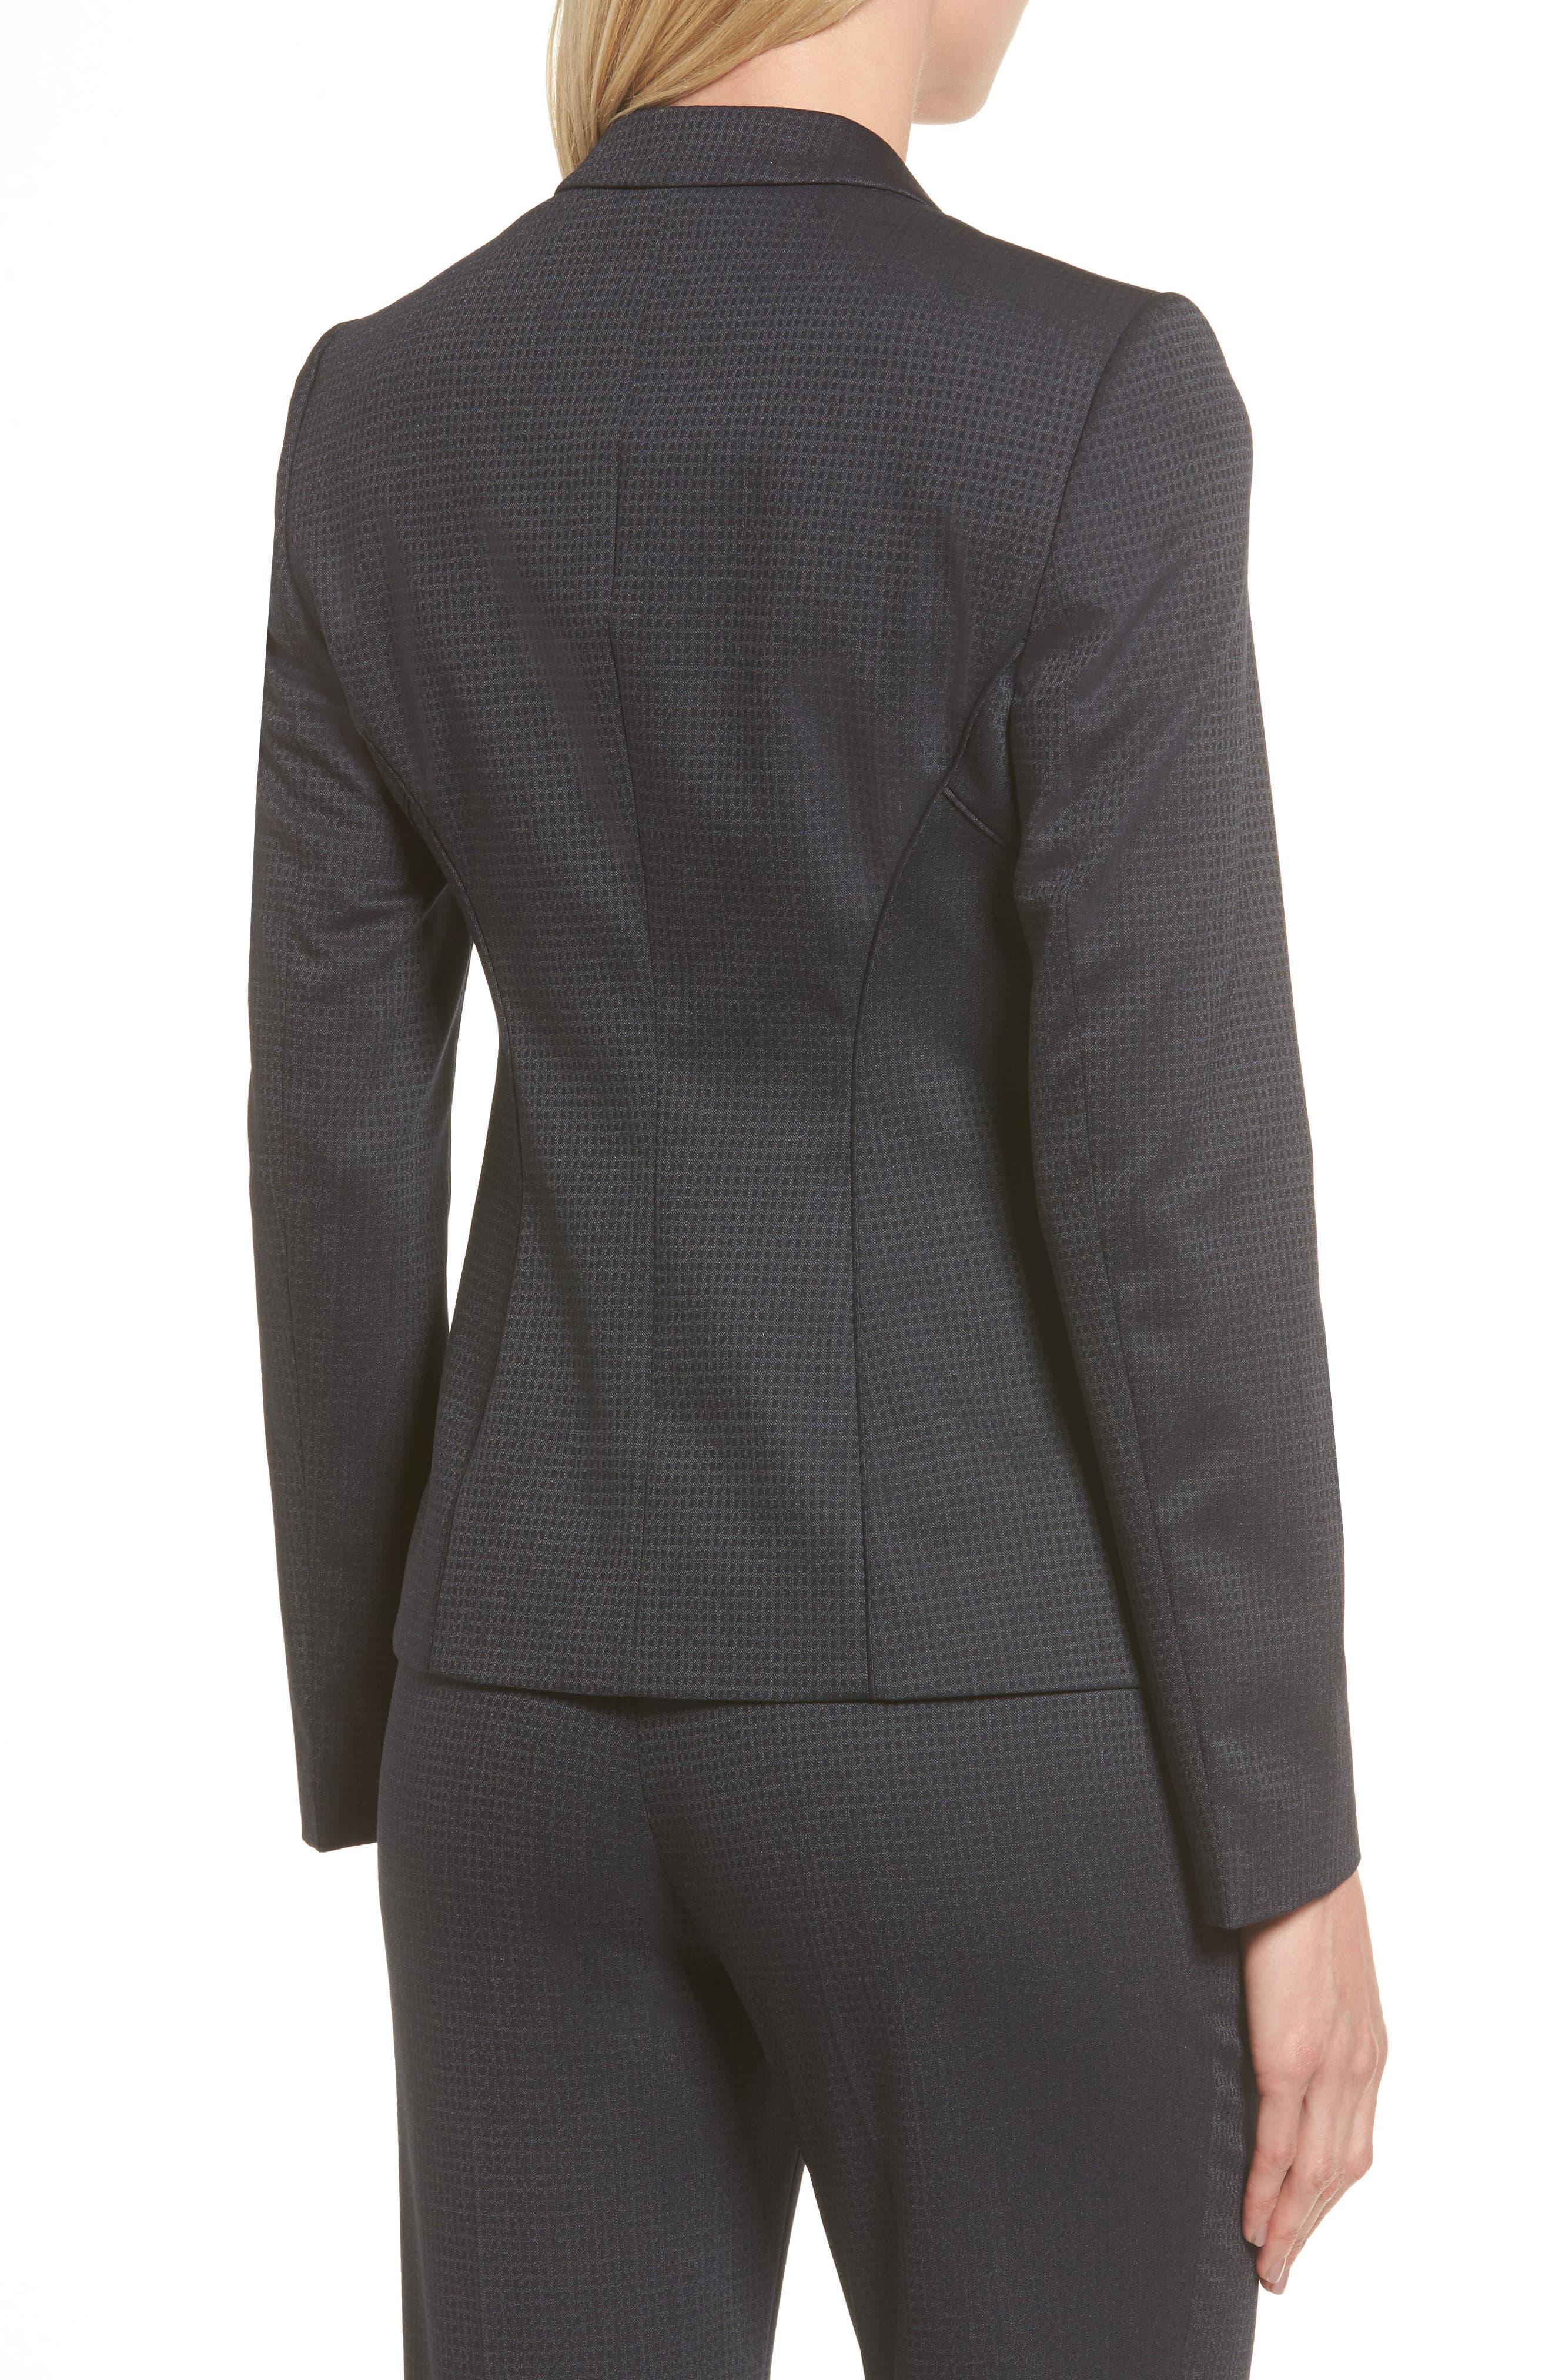 Jukani Check Wool Blend Suit Jacket,                             Alternate thumbnail 4, color,